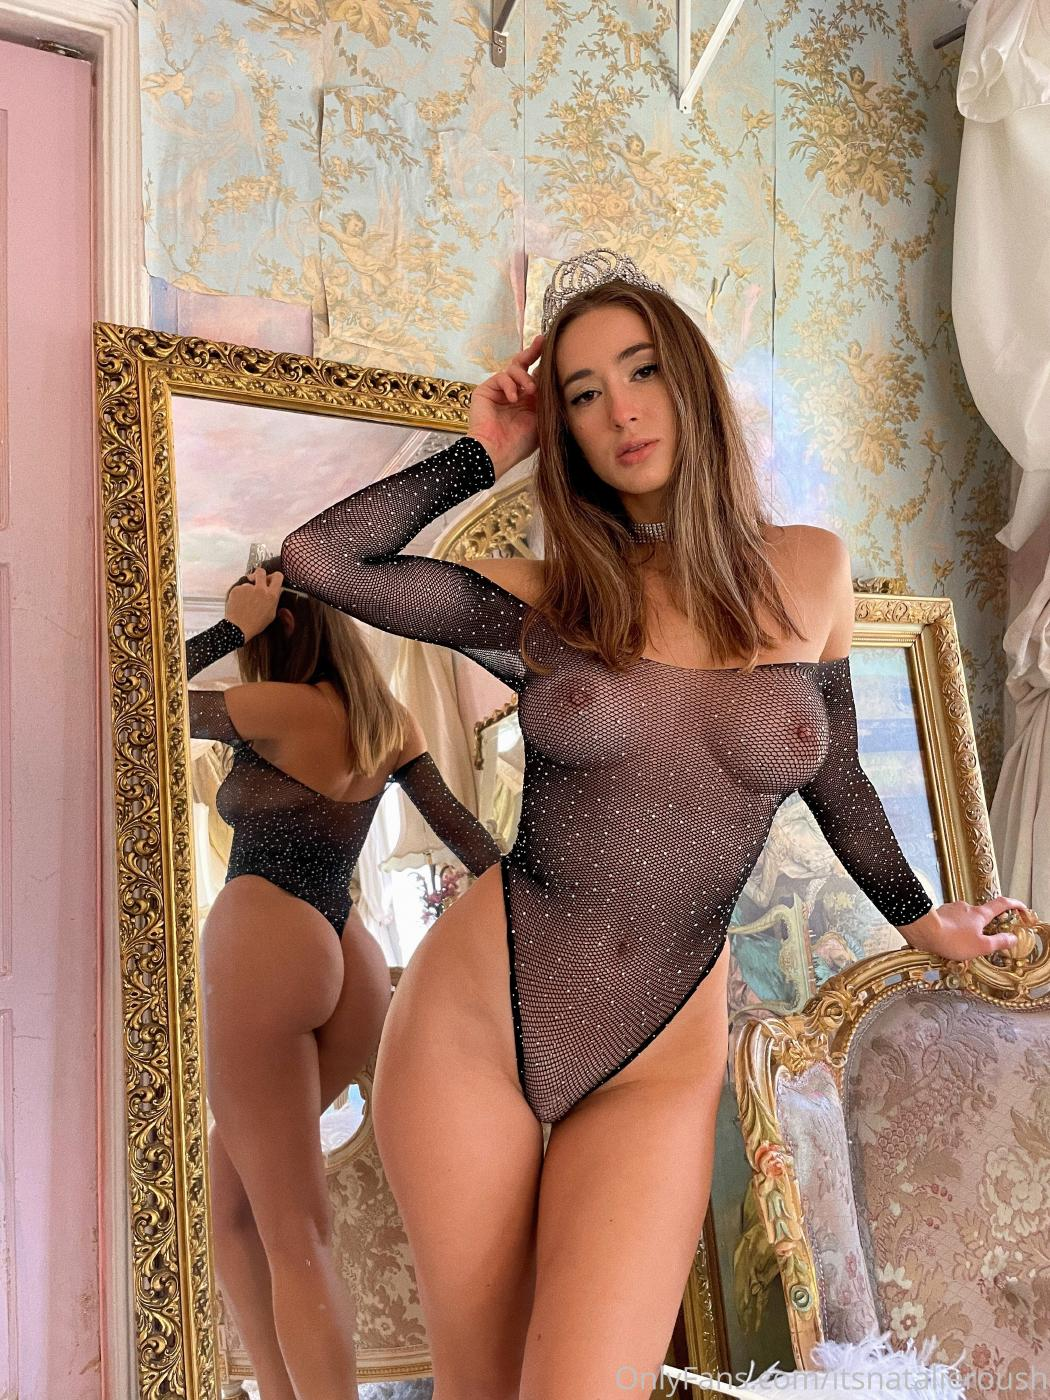 Natalie Roush Nude Fishnet Onlyfans Set Leaked Gduudc